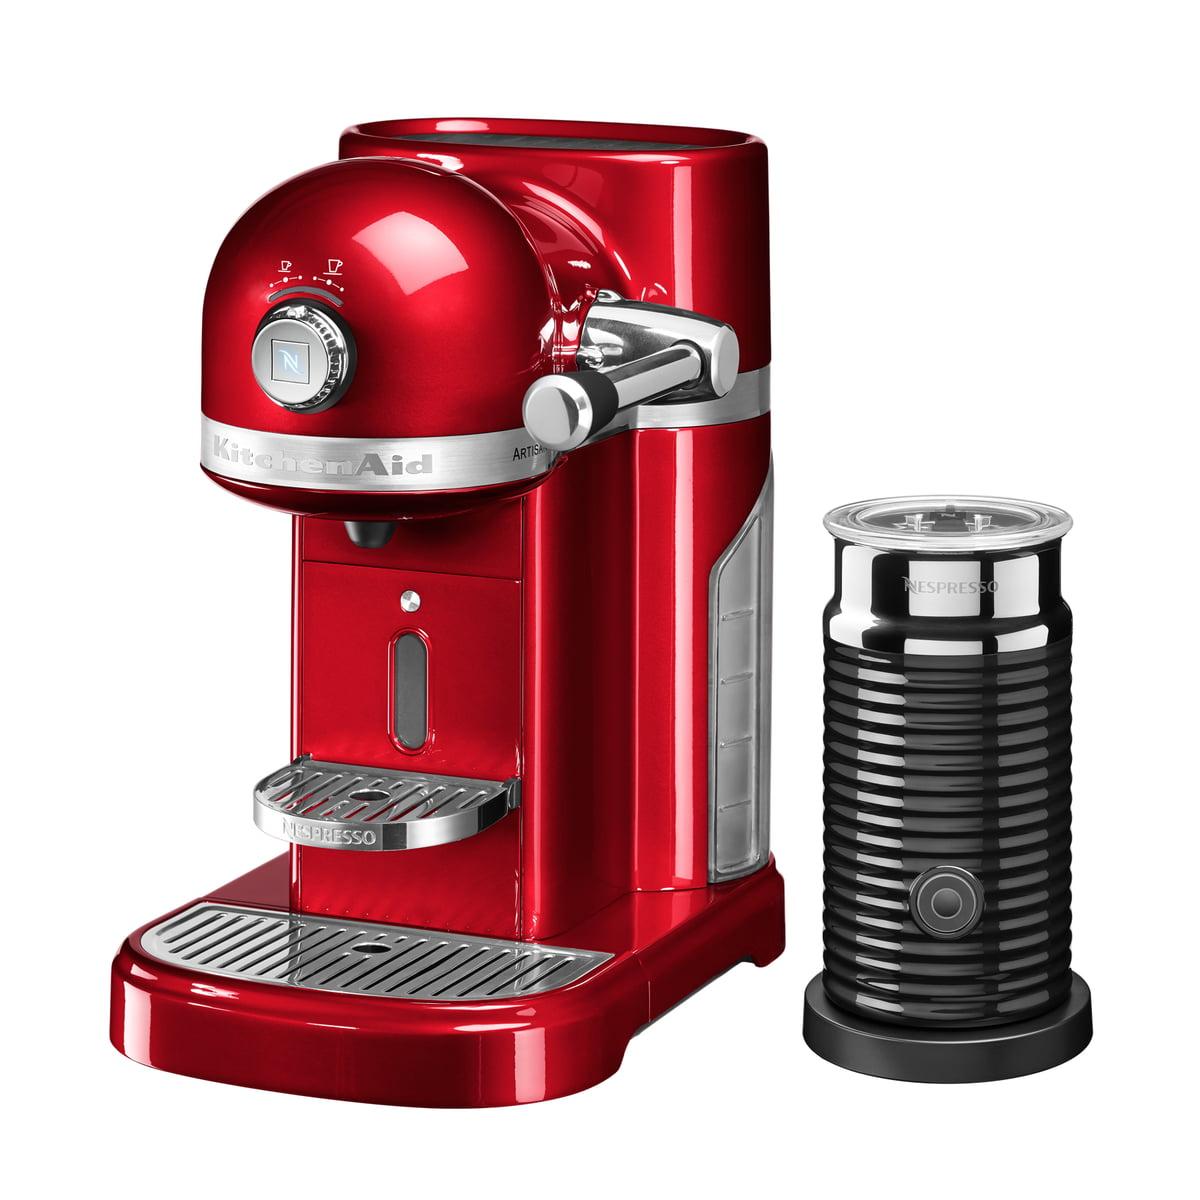 Artisan Nespresso Incl Aeroccino 3